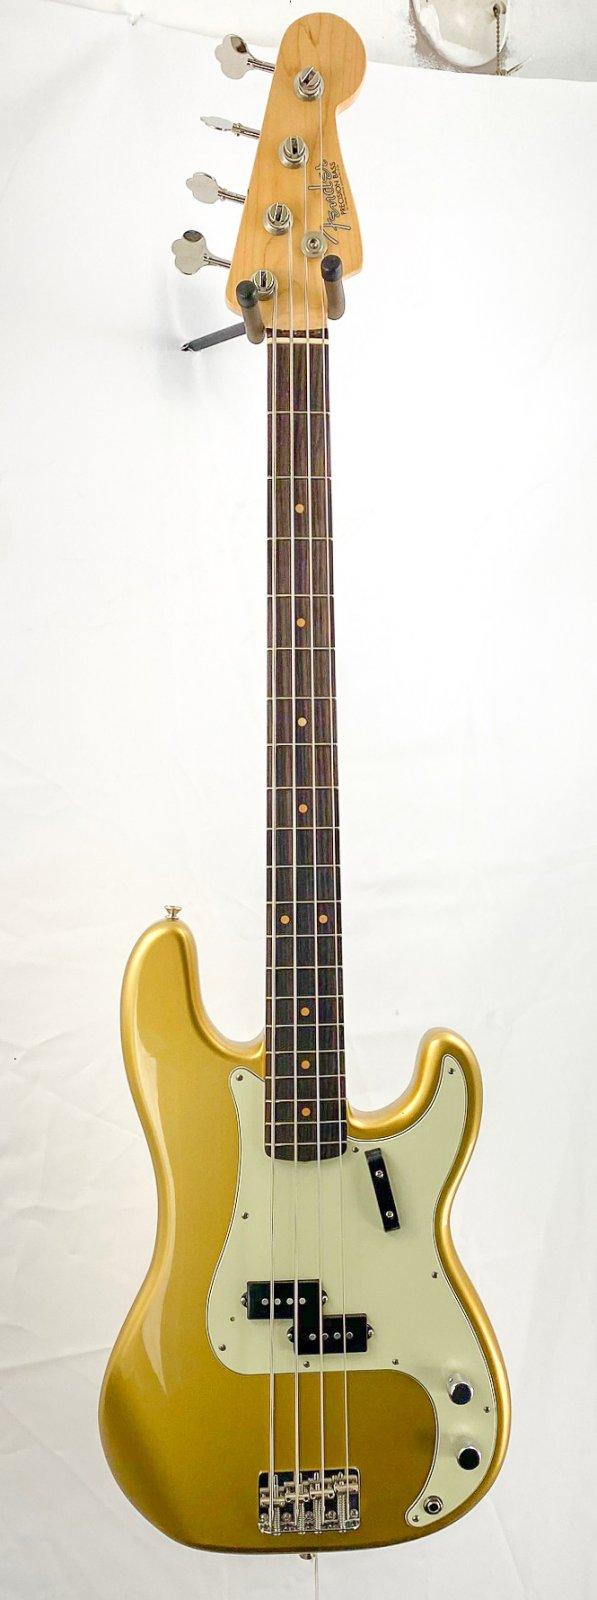 Fender American Original 60's/50's Precision Bass - w/upgrades